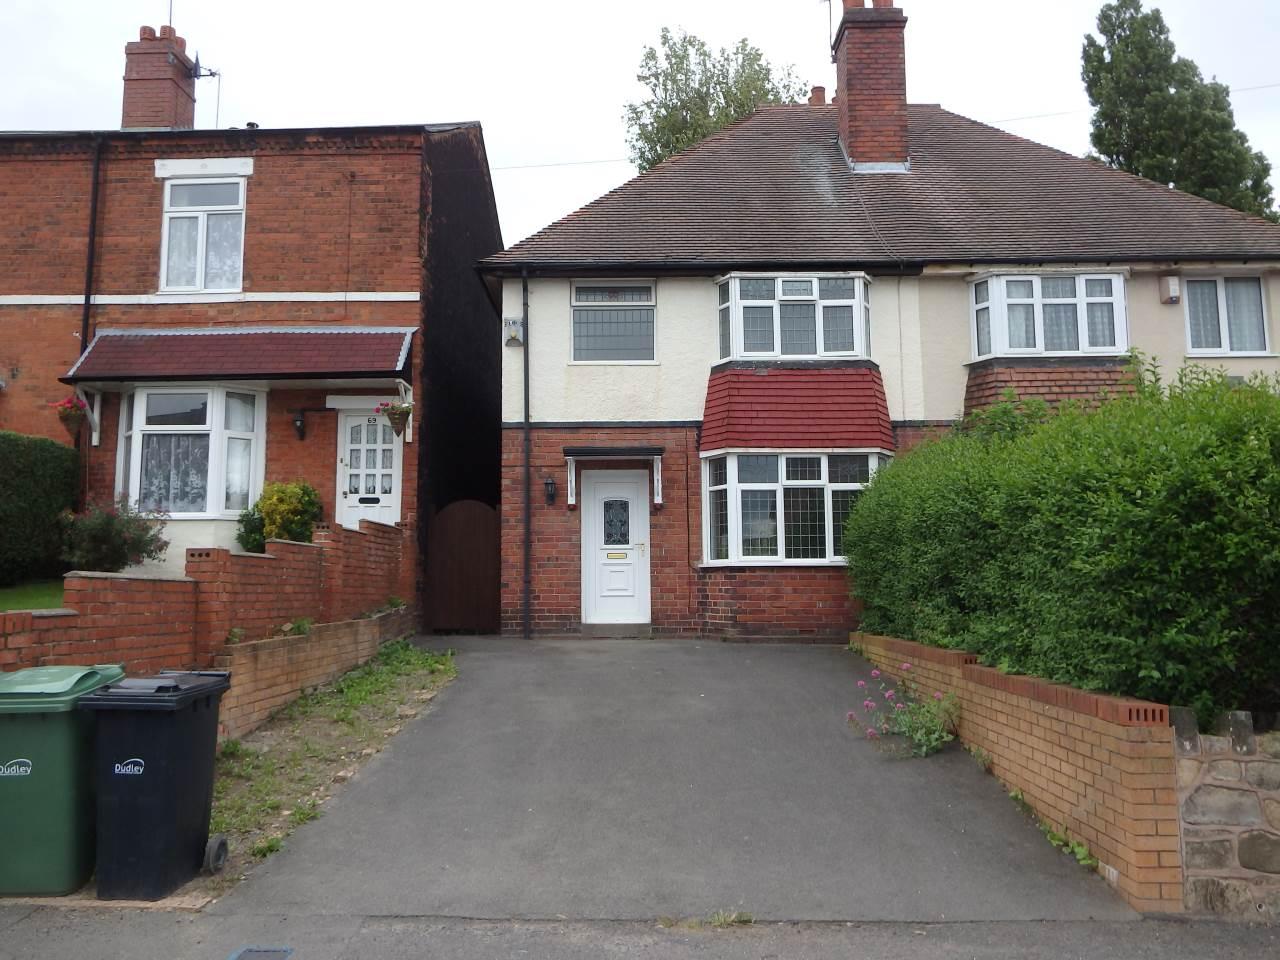 Dibdale Street, Dudley, West Midlands